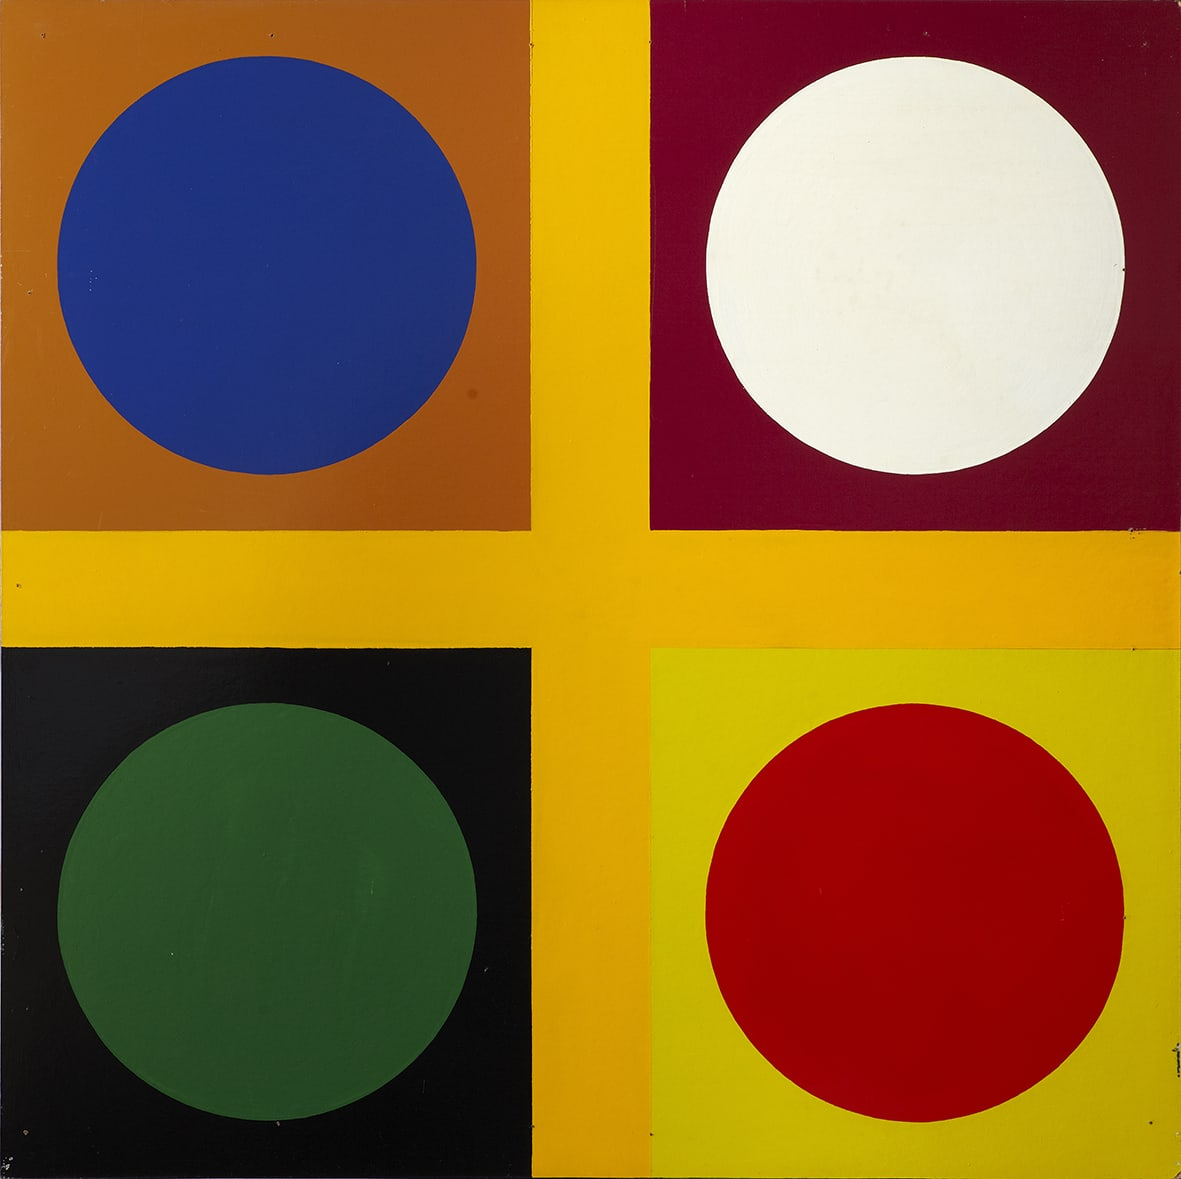 "<span class=""link fancybox-details-link""><a href=""/exhibitions/143/works/artworks11010/"">View Detail Page</a></span><div class=""artist""><strong> Poul Gernes</strong></div><div class=""title""><em>Untitled (tic tac toe painting)</em>, 1967</div><div class=""medium"">enamel paint on masonite</div><div class=""dimensions"">160.0 x 160.0 cm<br>62 15/16 x 62 15/16 in</div>"